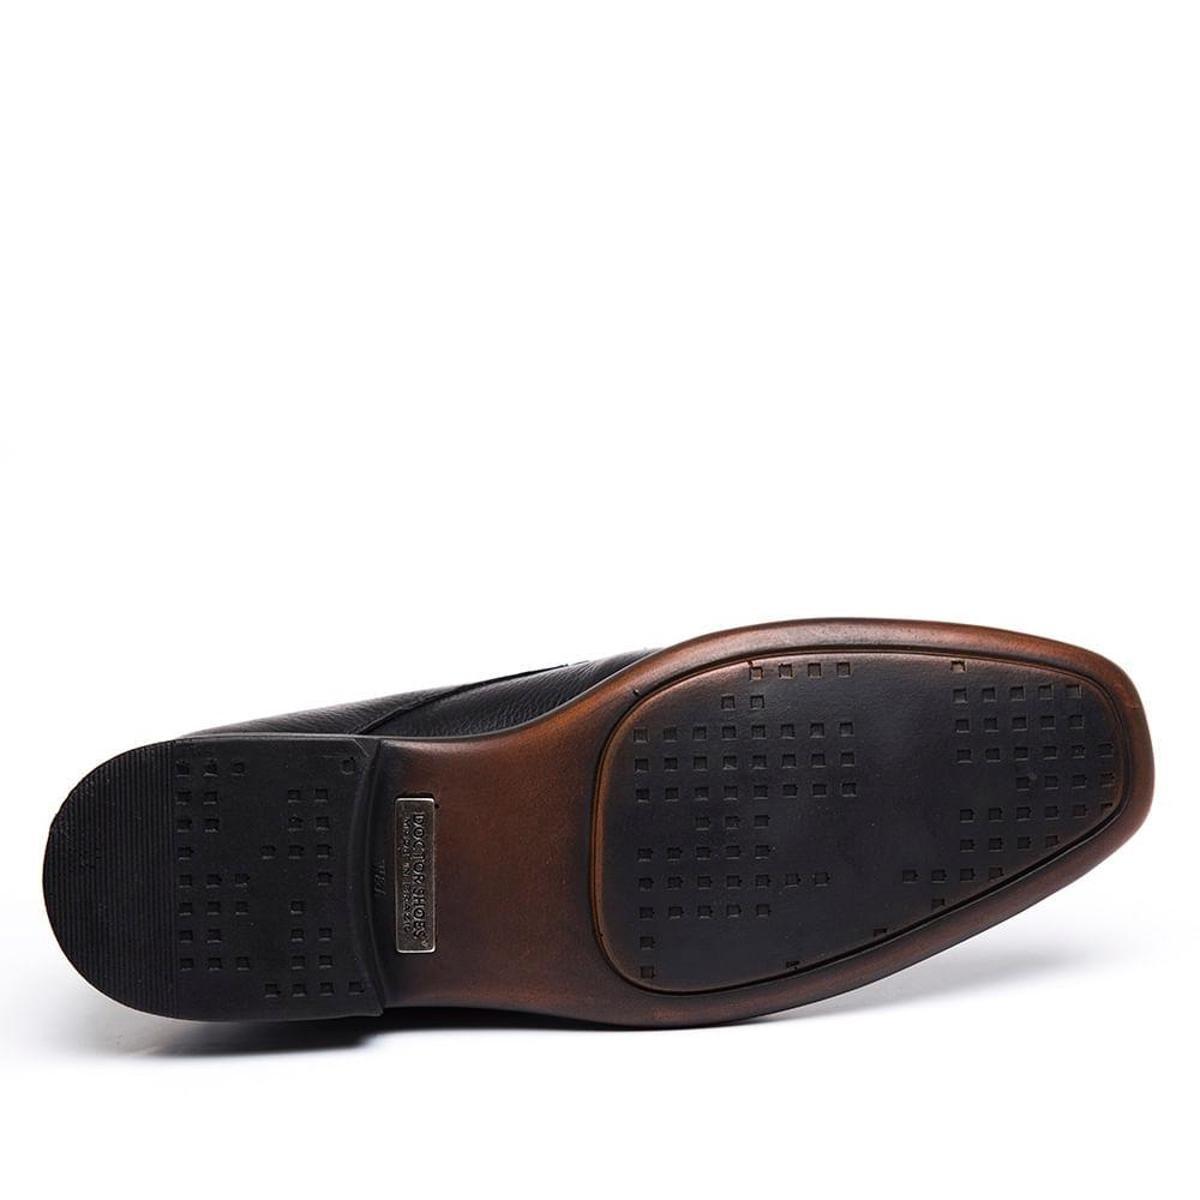 486602 Social Doctor Sapato Preto Shoes Social Comfort Sapato Extra 0qUxg4w